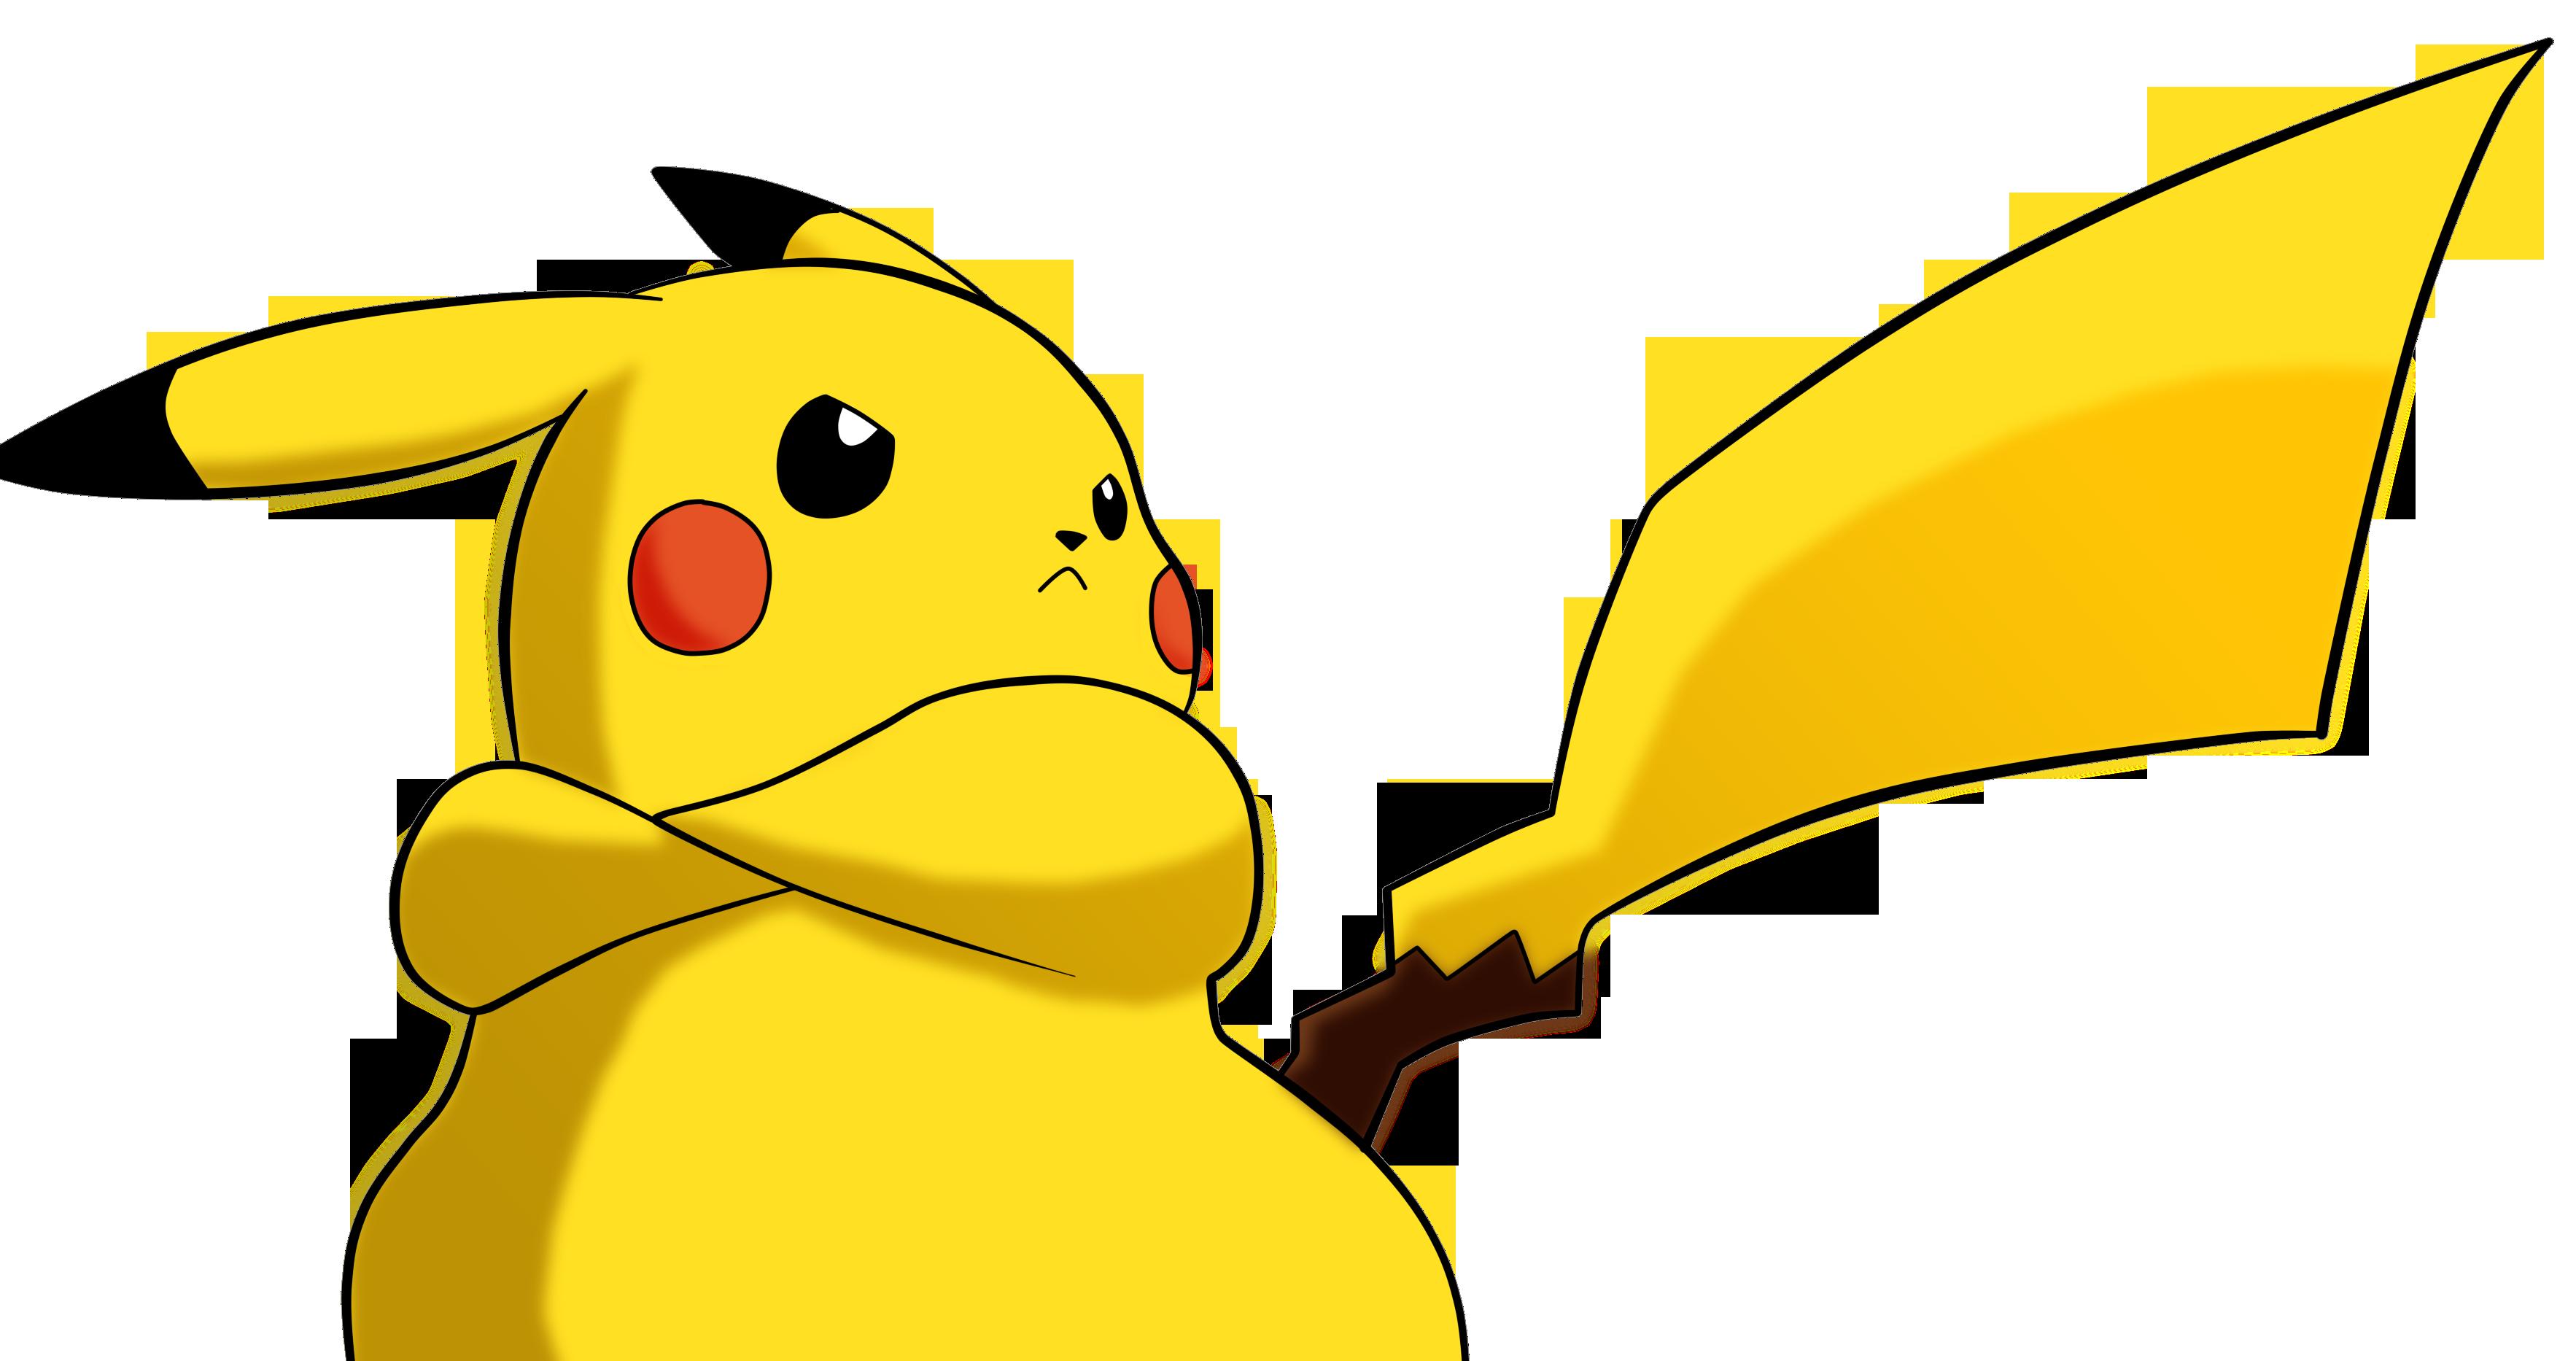 The tudyk intolerance litmus. Pikachu clipart lightning